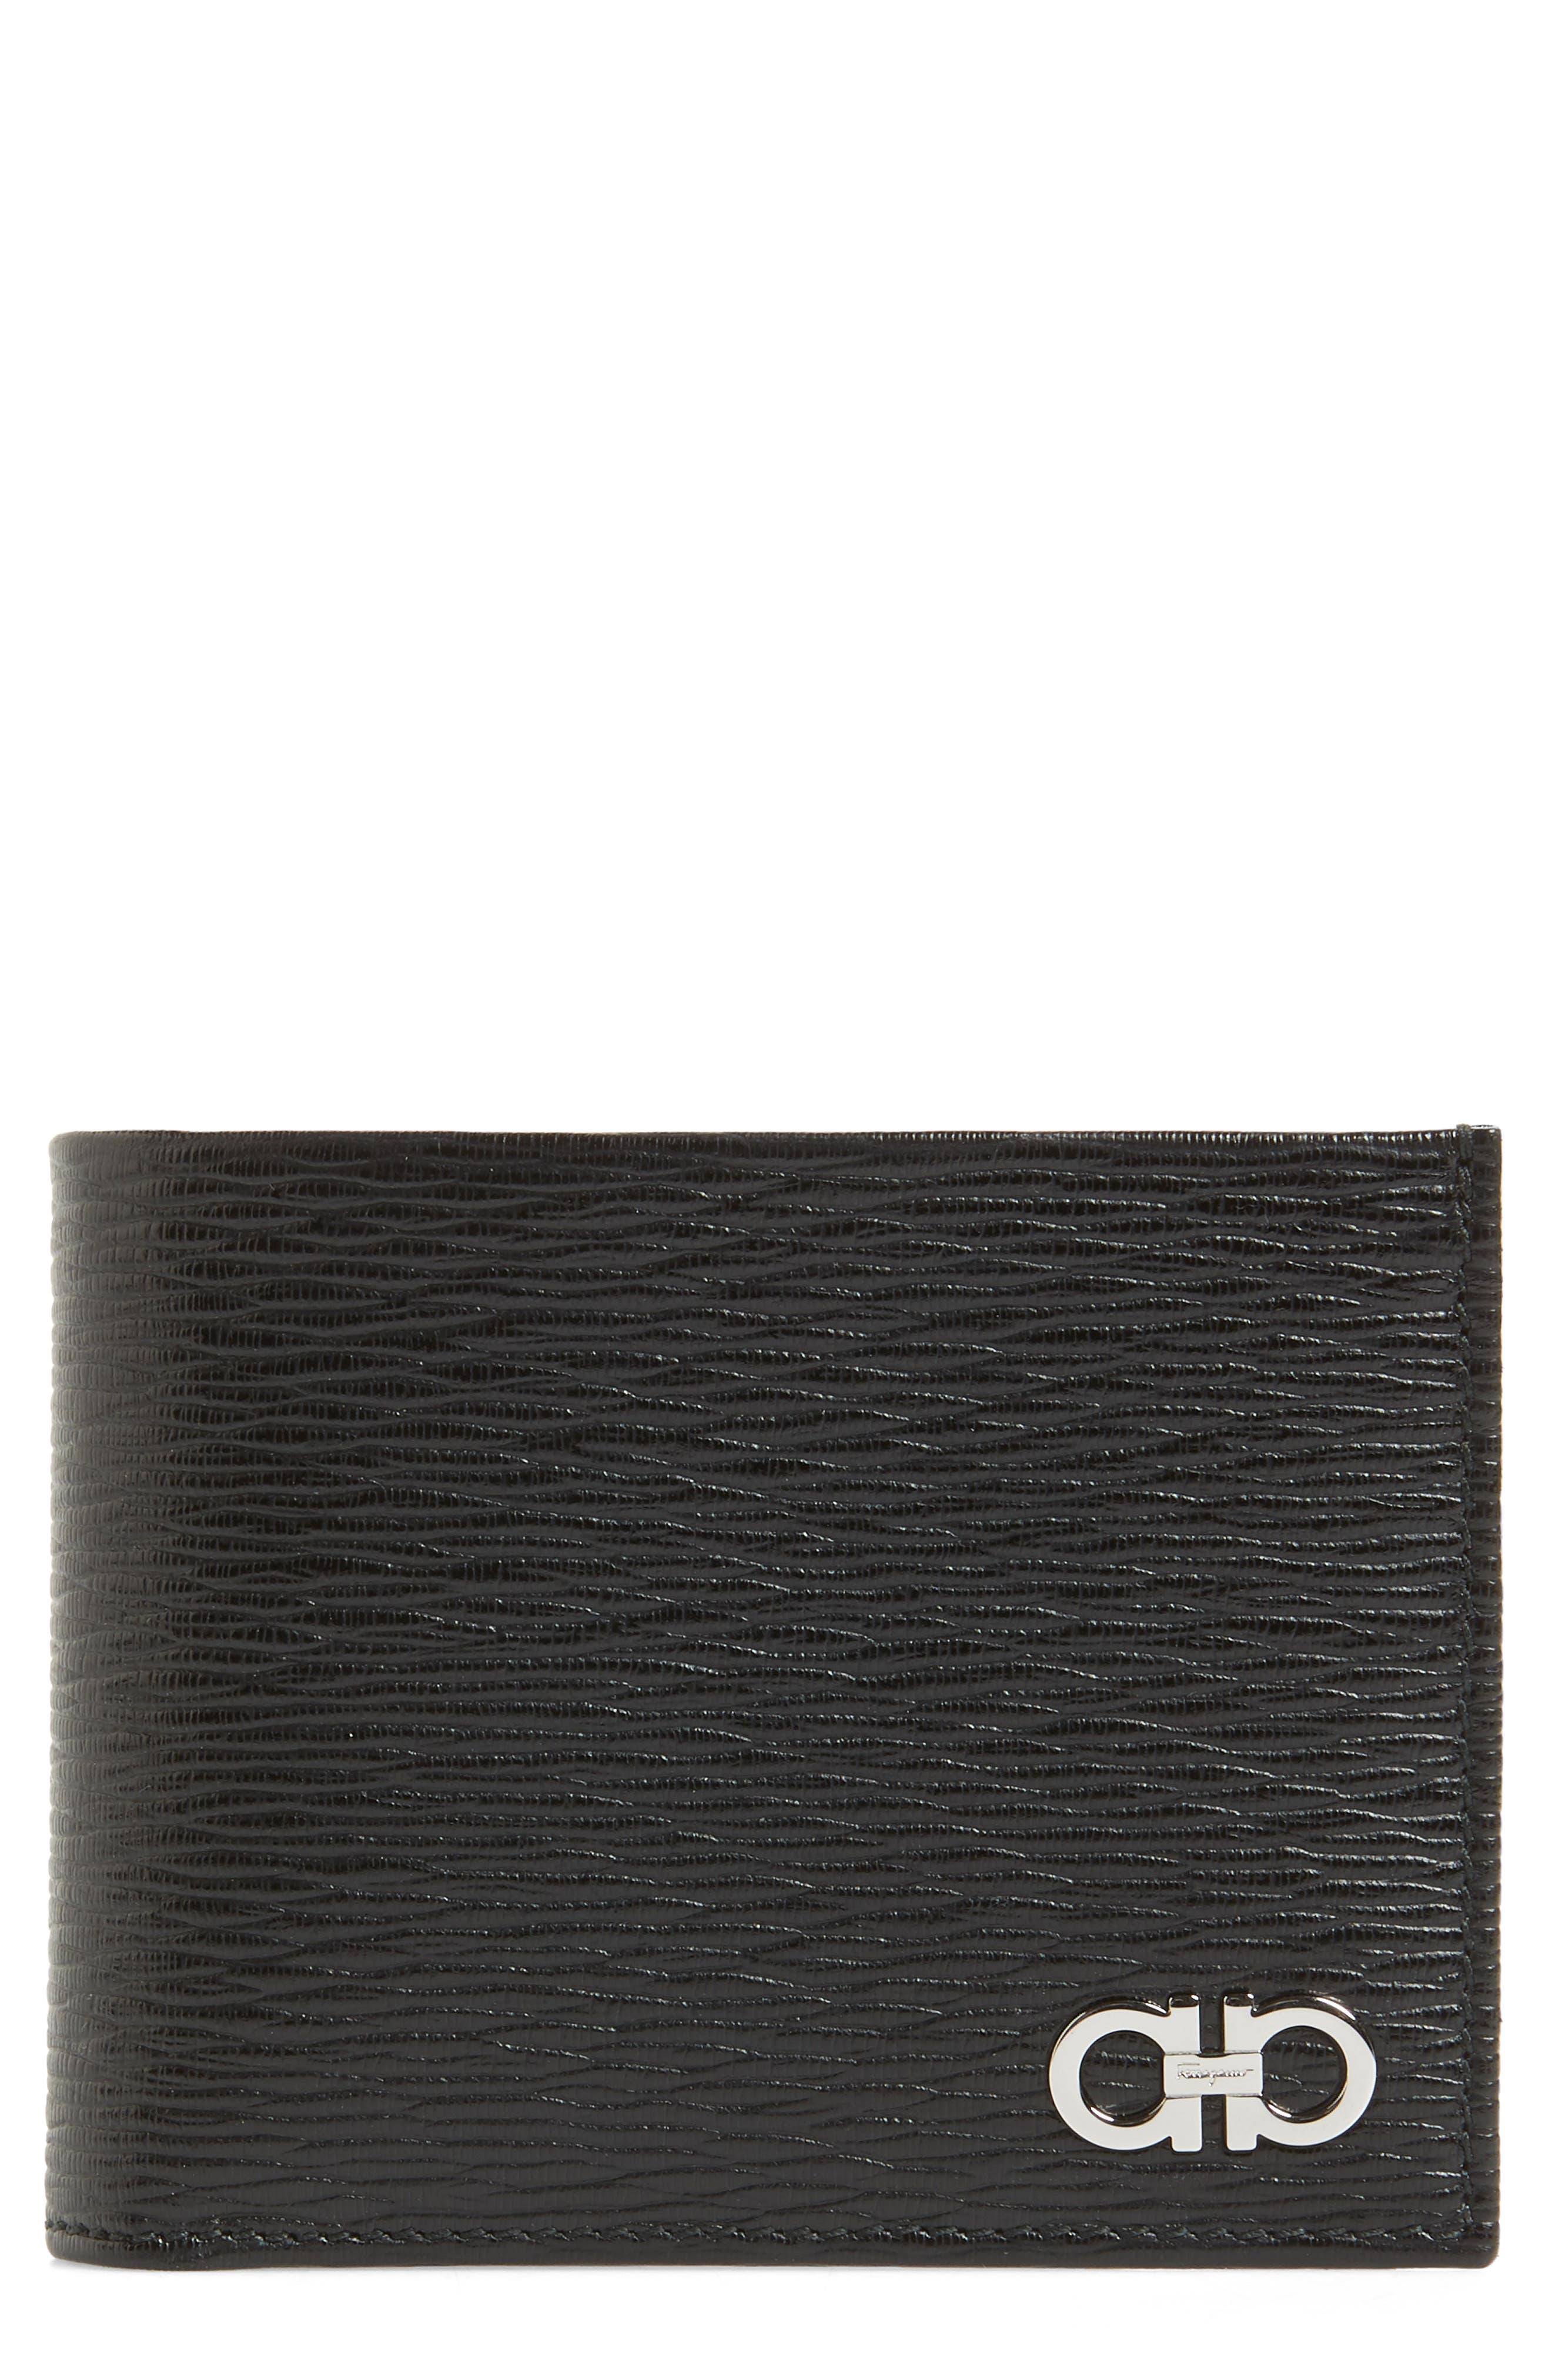 SALVATORE FERRAGAMO, Revival Leather Card Case, Main thumbnail 1, color, BLACK